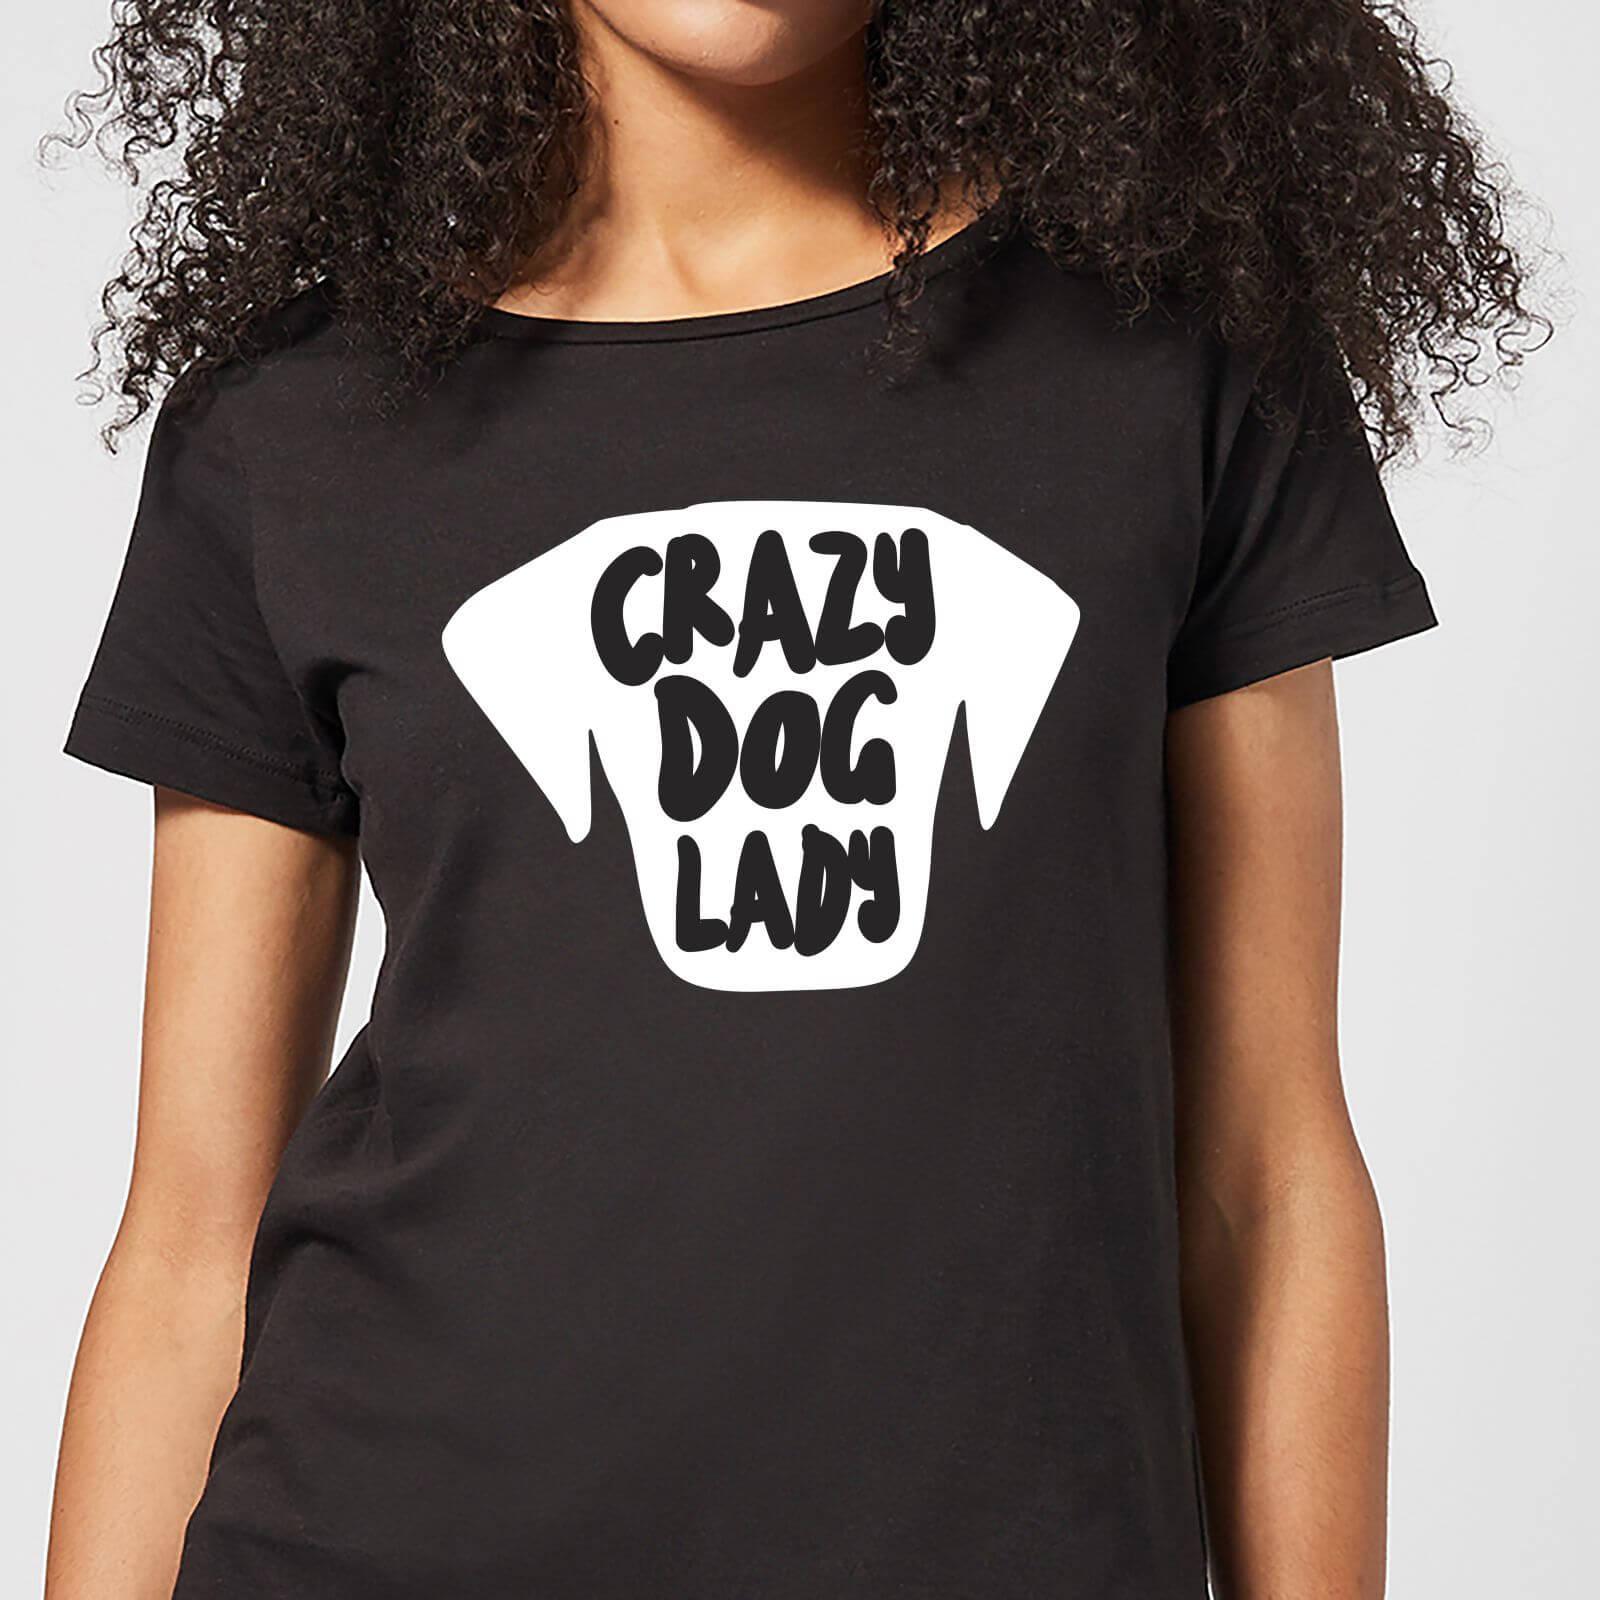 By IWOOT Crazy Dog Lady Women's T-Shirt - Black - XS - Black